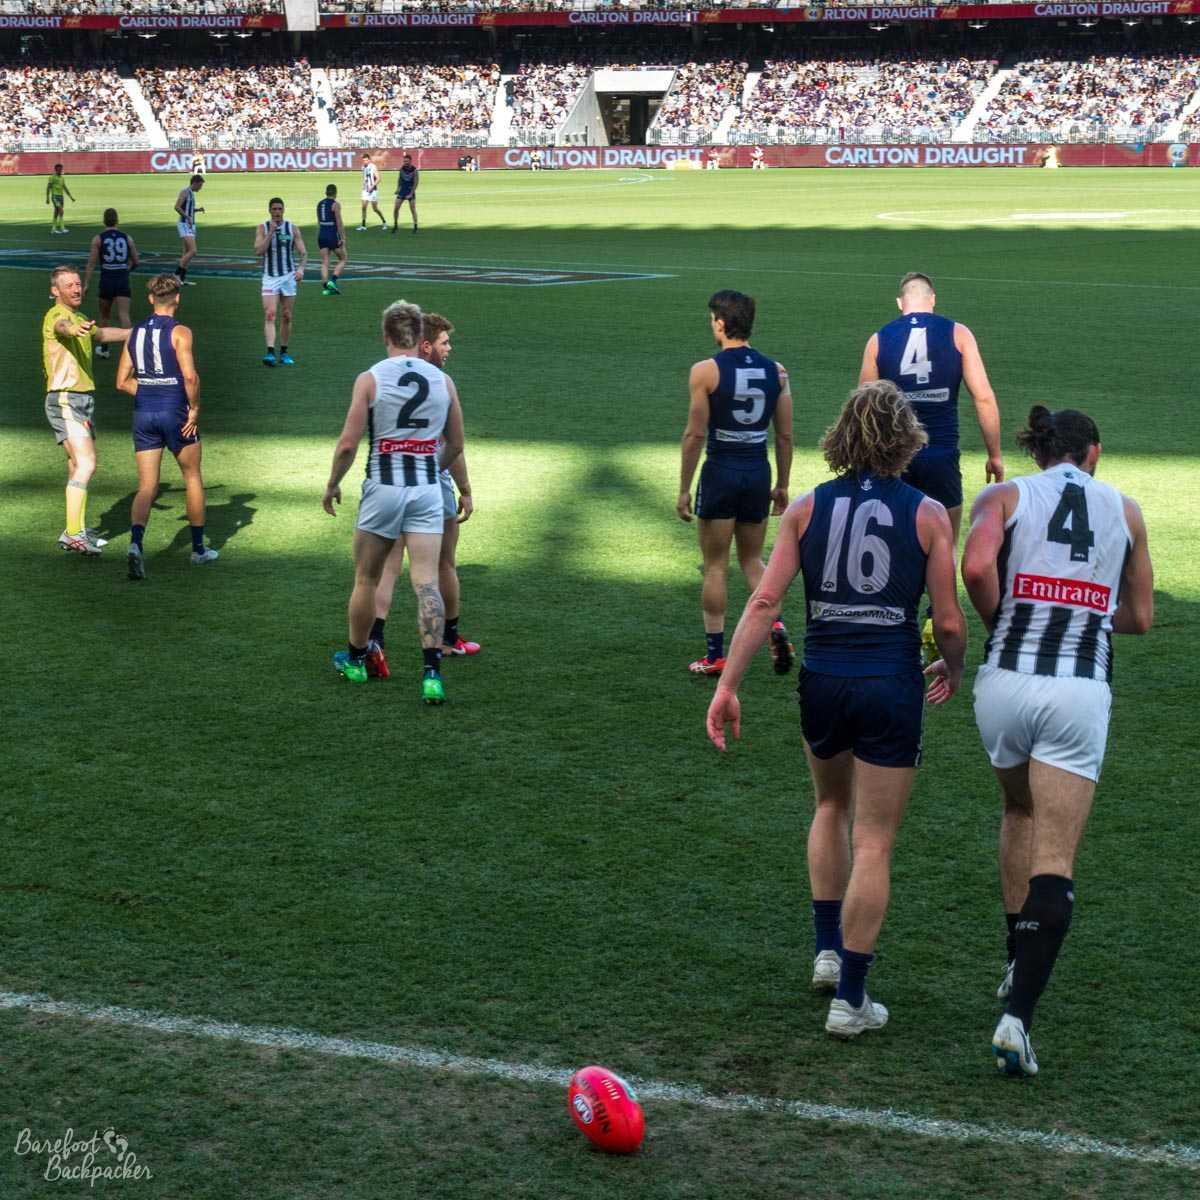 Play during an AFL game at Optus Stadium, Perth